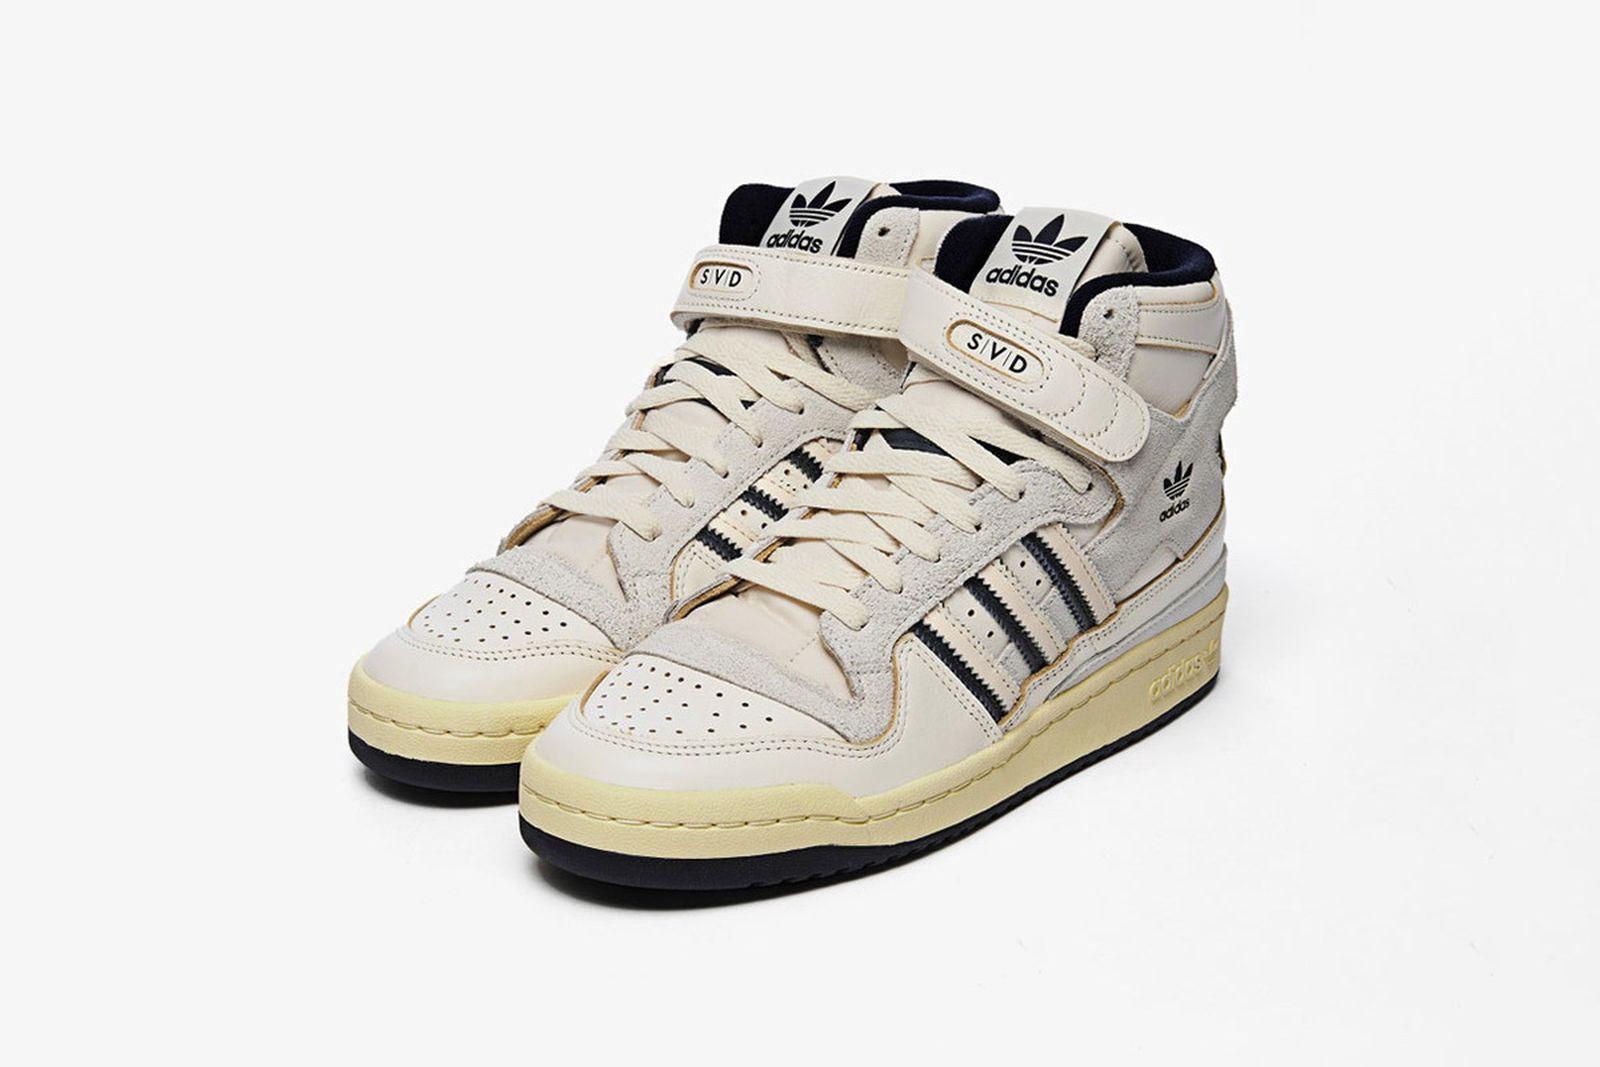 01_GZ8976_sivasdescalzo-adidas-Forum_84_HI